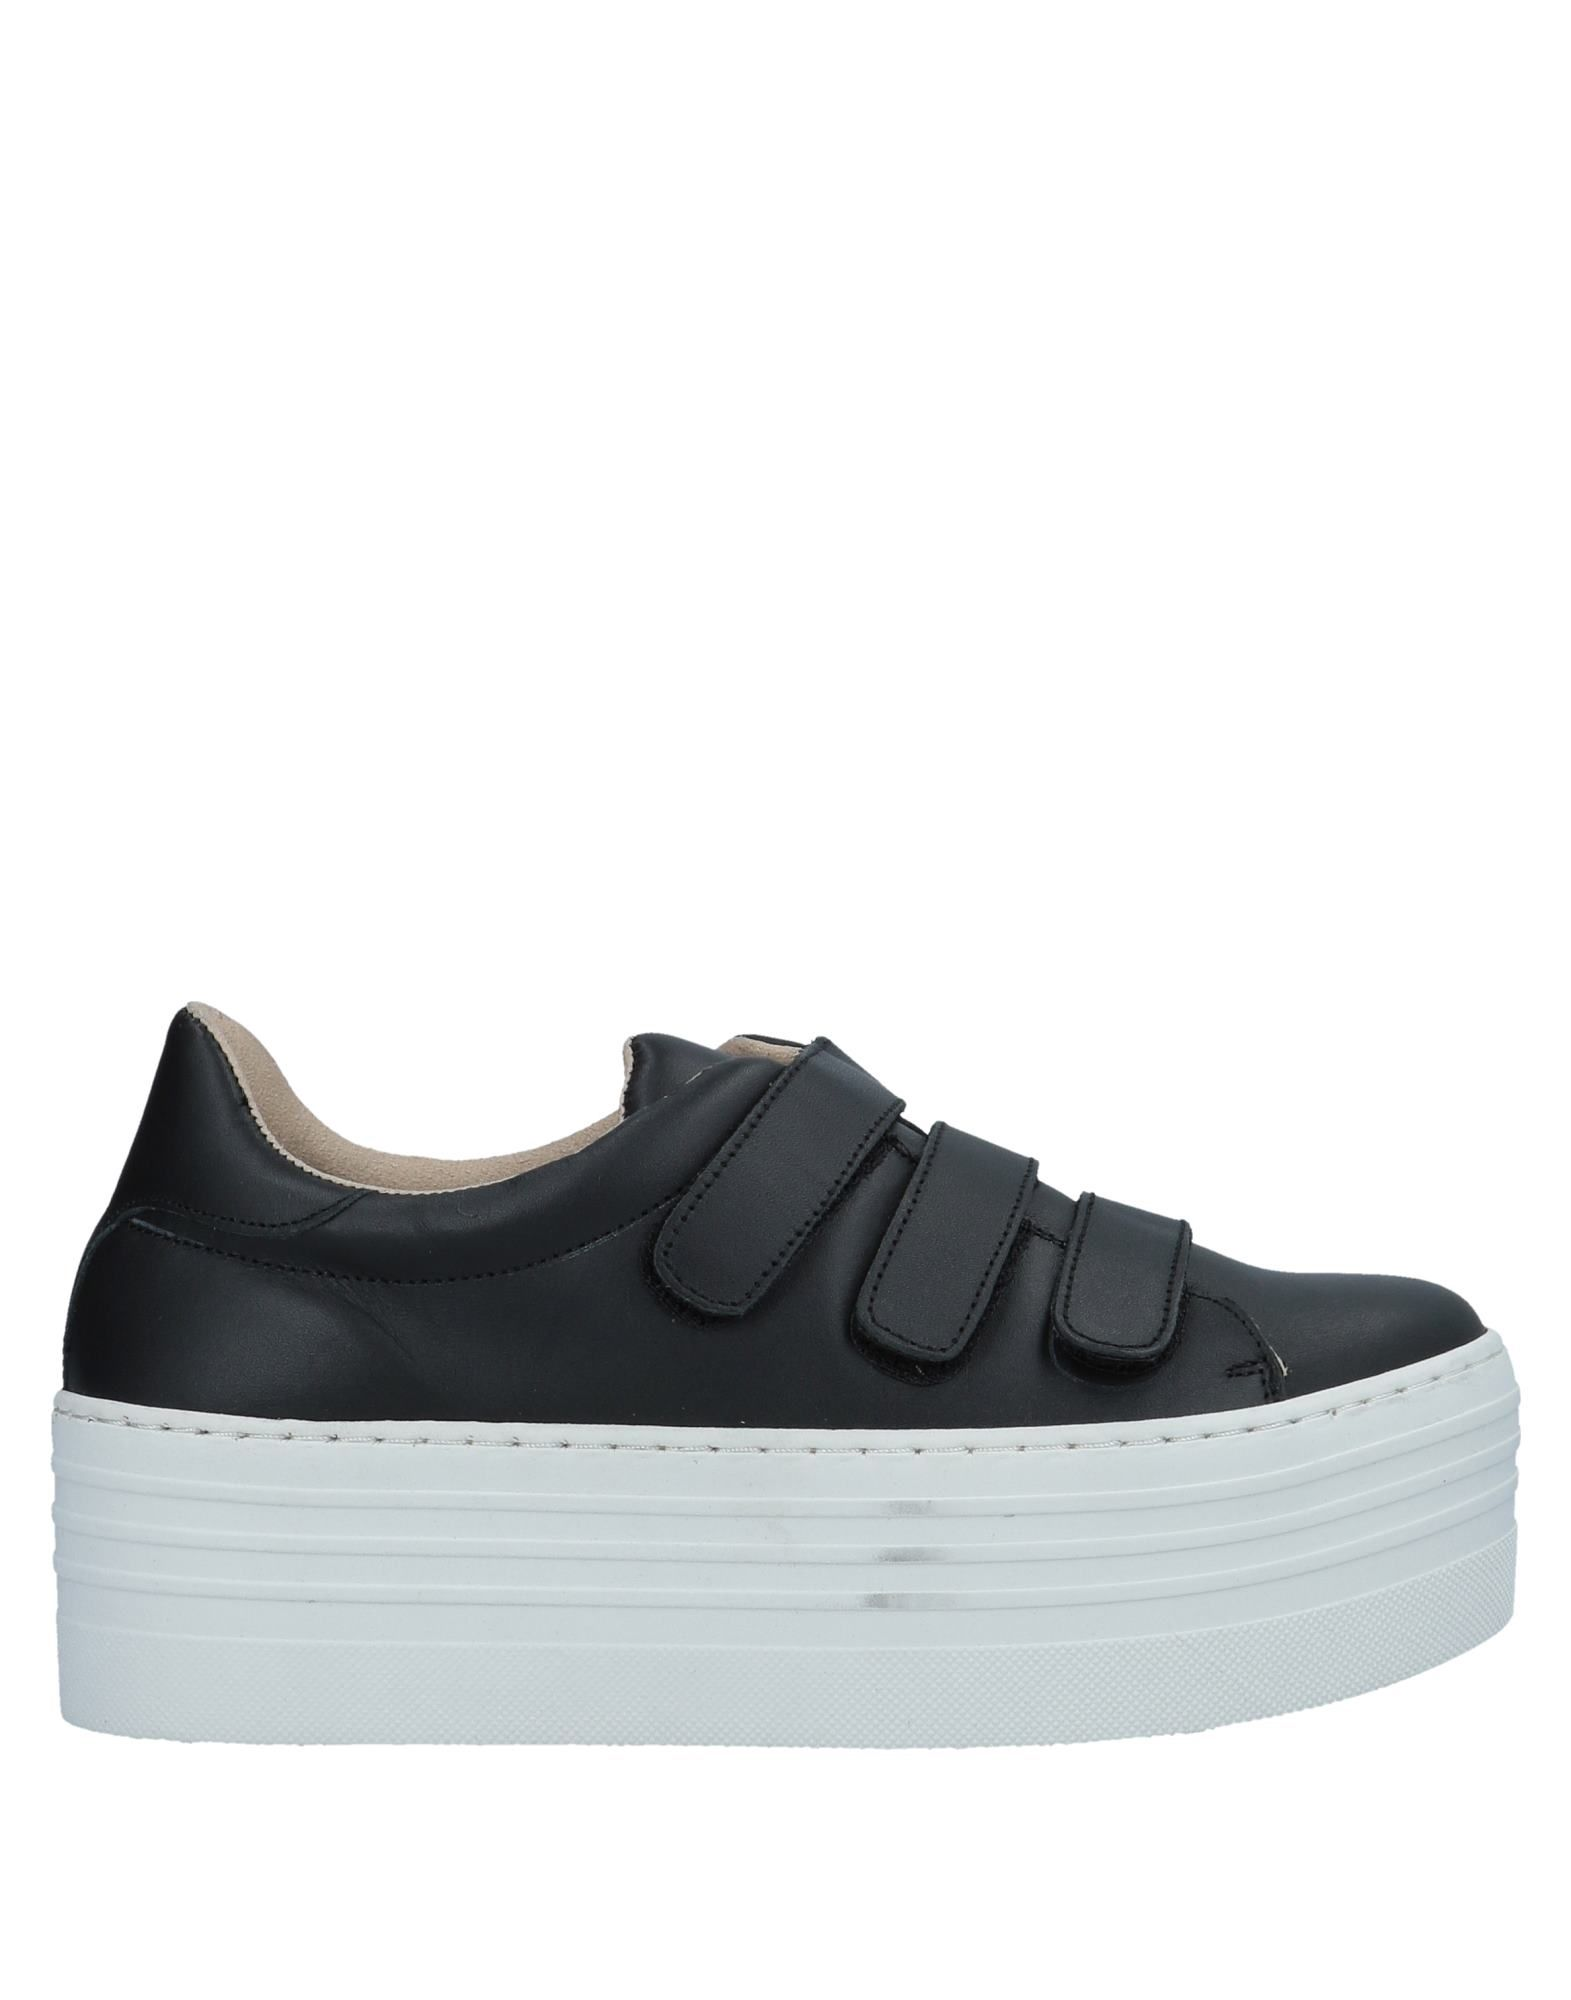 Flavio on Creation Sneakers - Women Flavio Creation Sneakers online on Flavio  Australia - 11552961SO 303dad